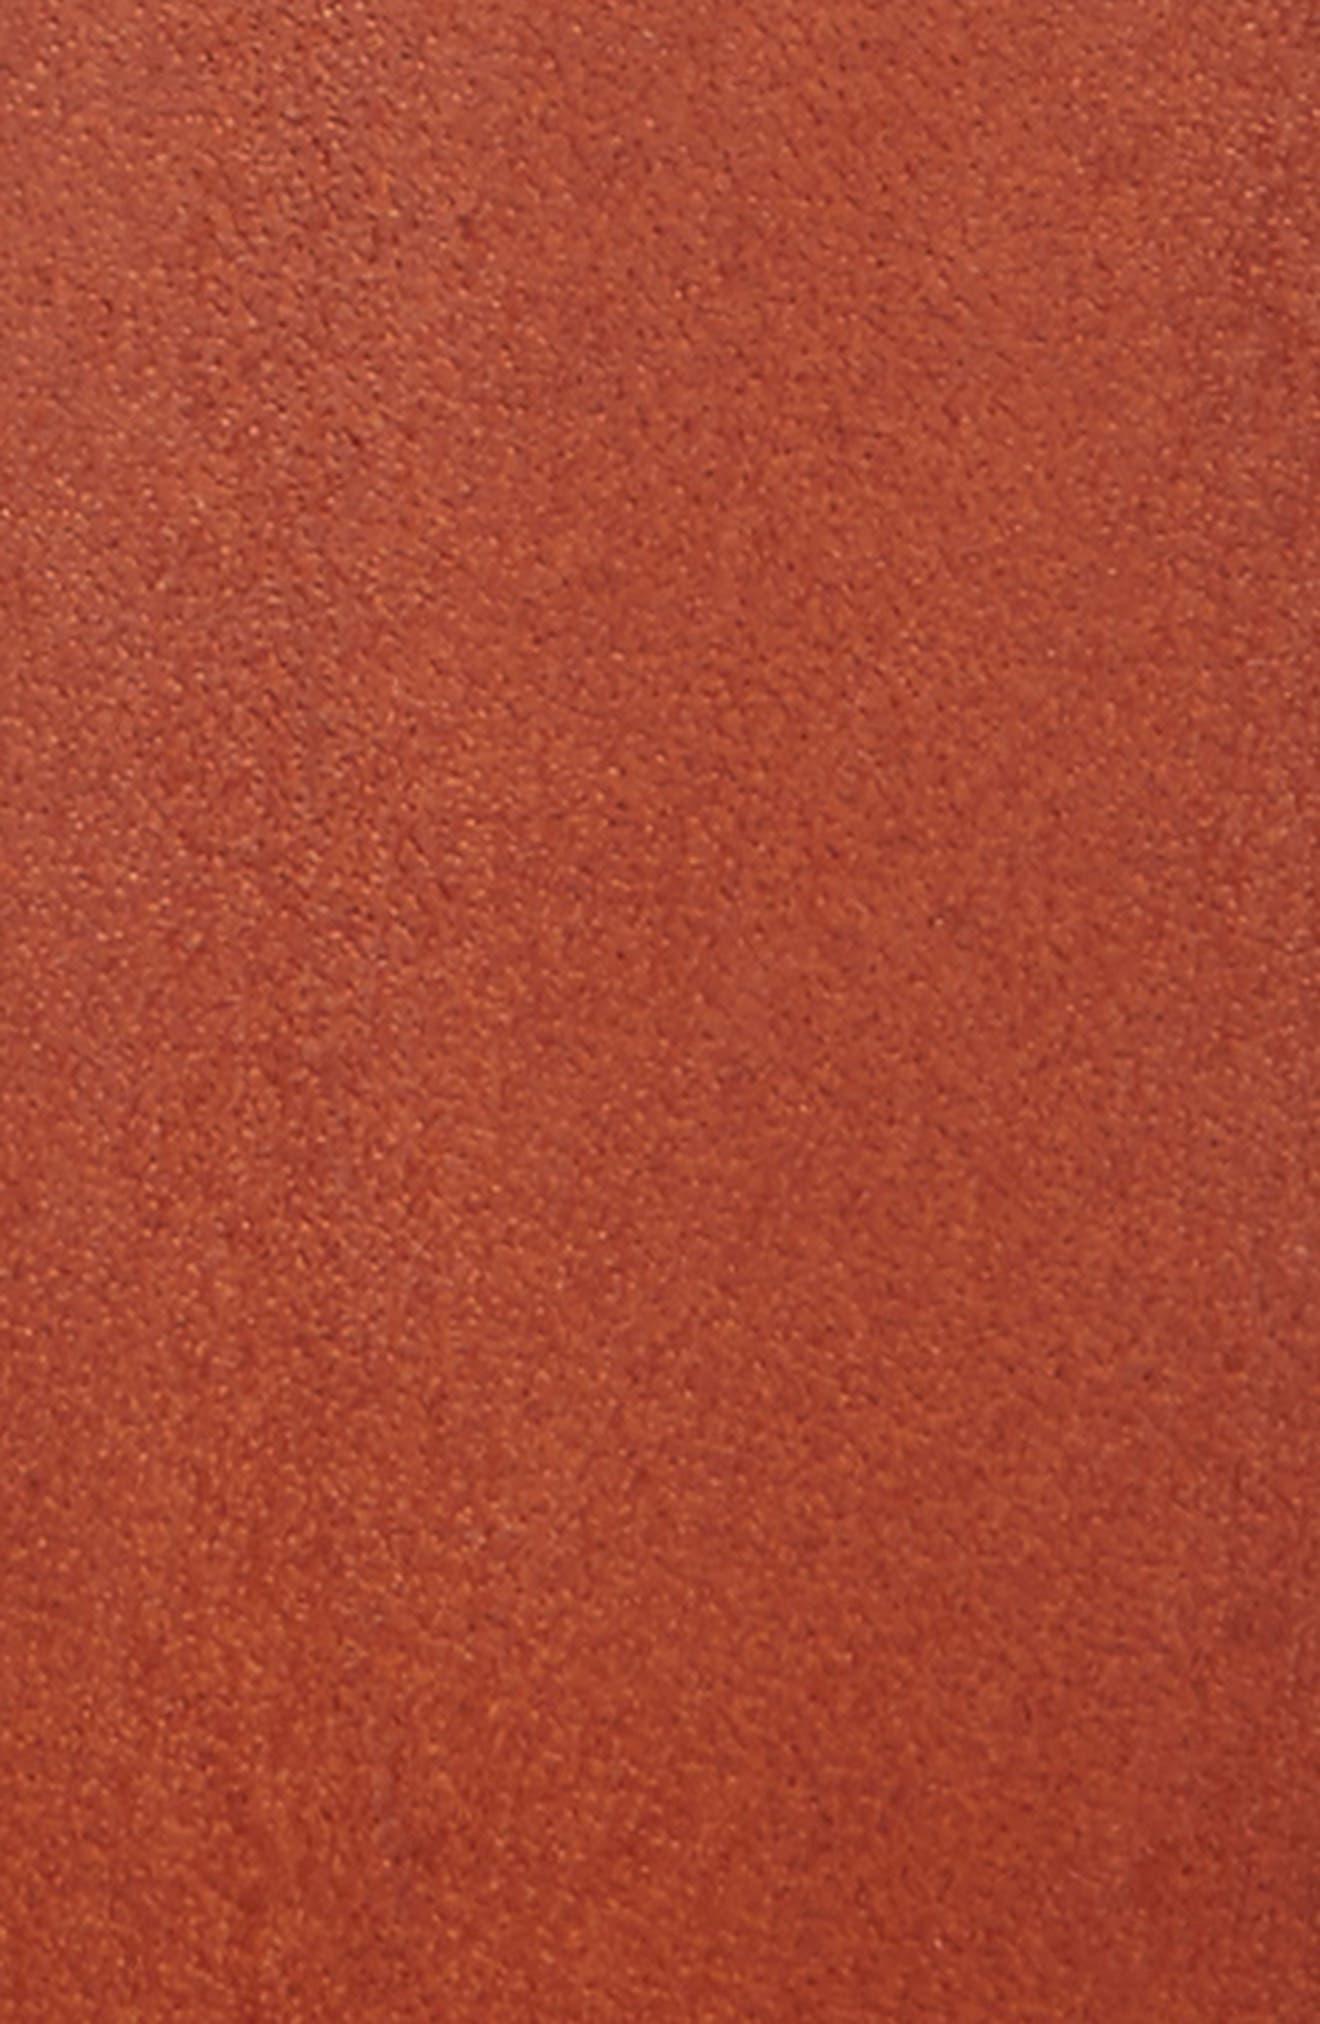 Sammyo Leather Belt,                             Alternate thumbnail 2, color,                             210